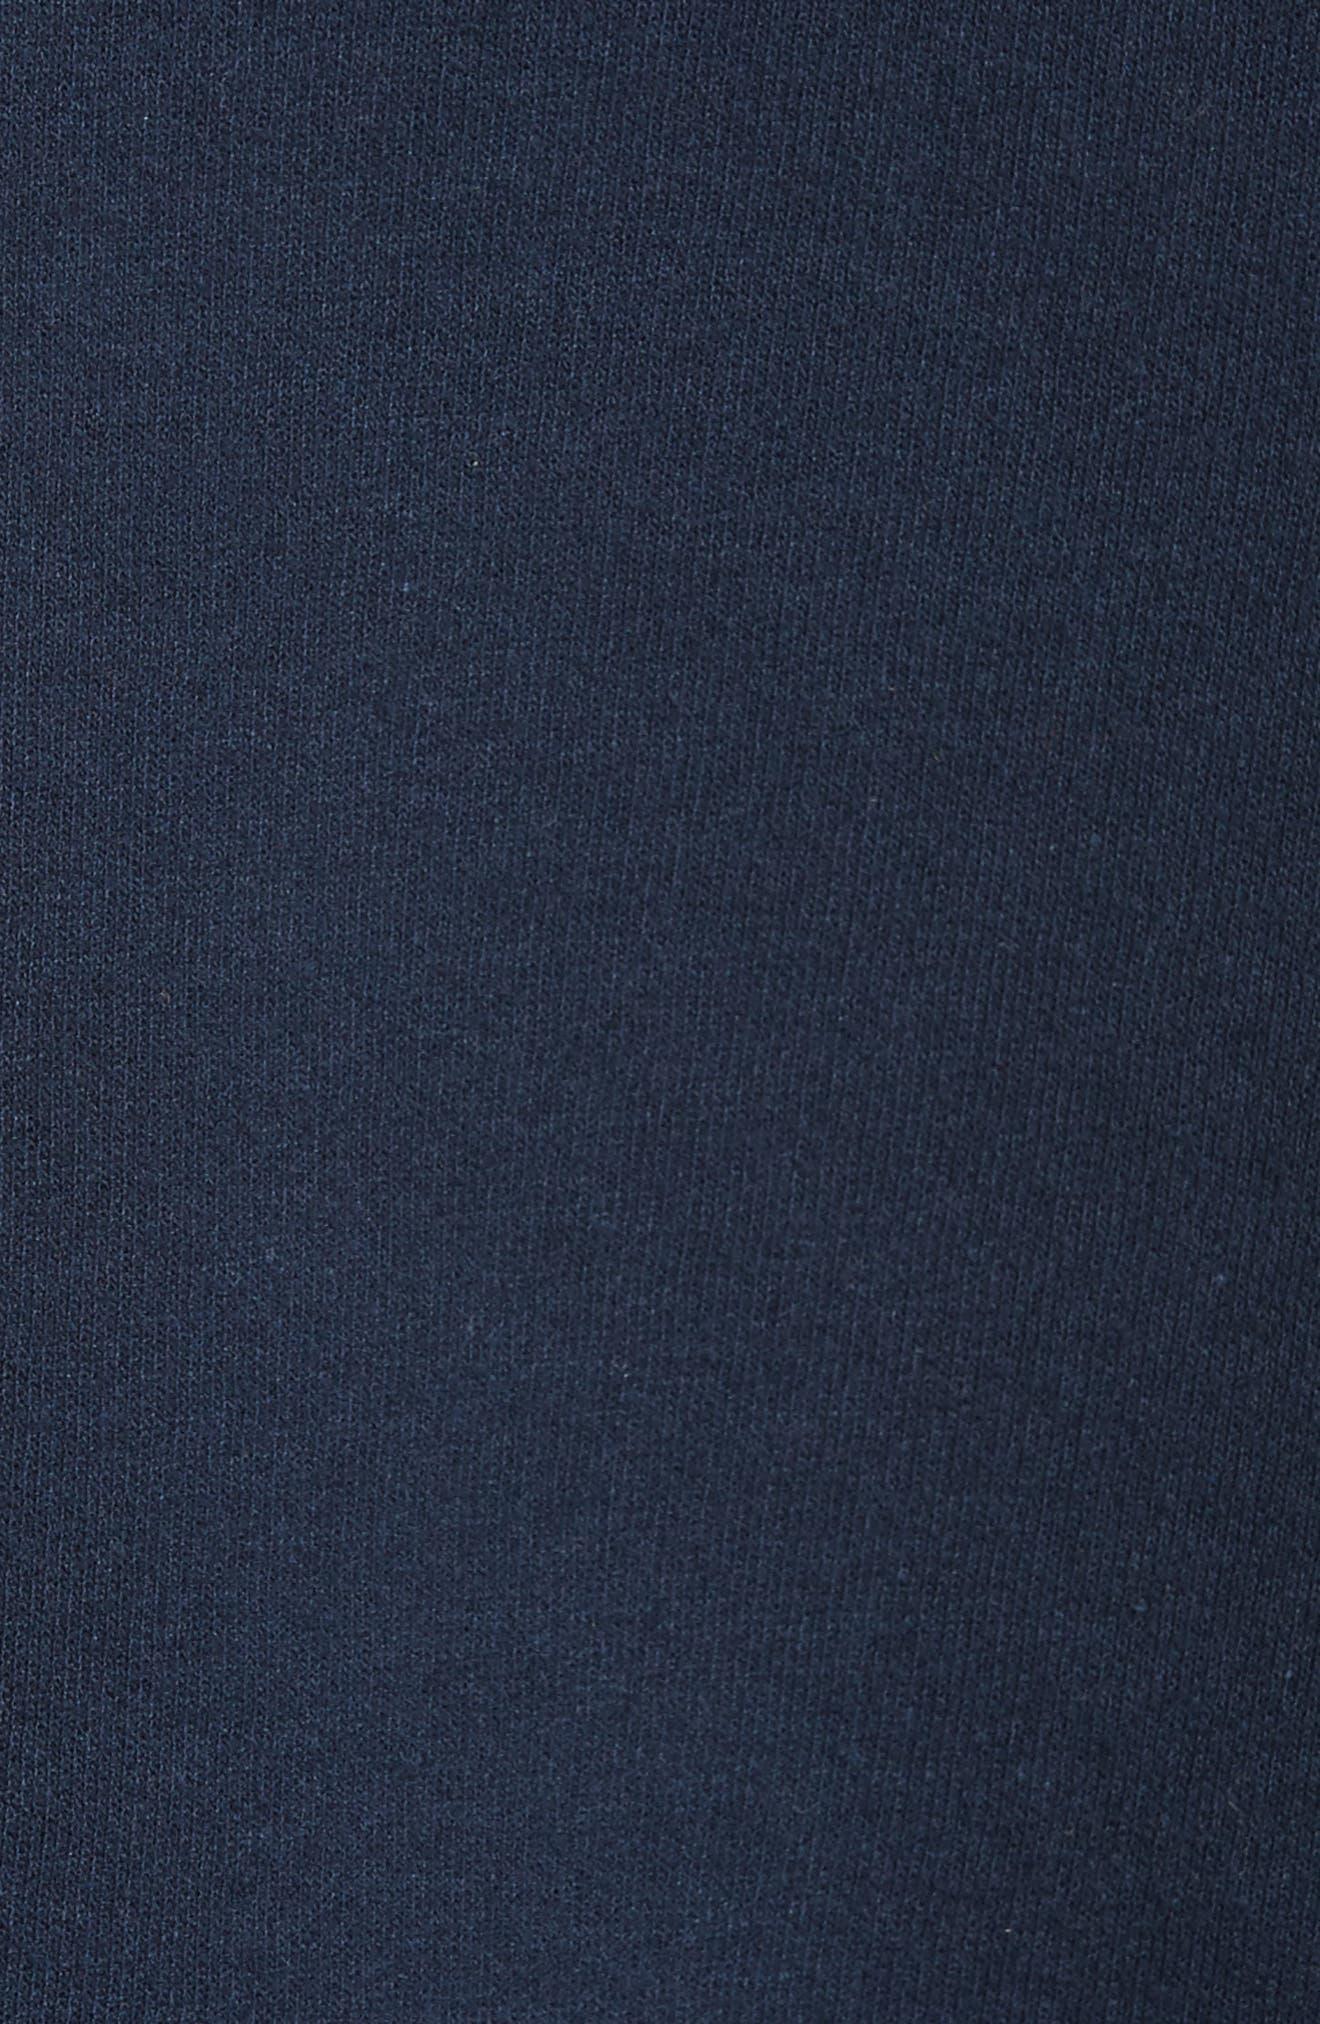 Sequin Sweatshirt Tank,                             Alternate thumbnail 5, color,                             Navy